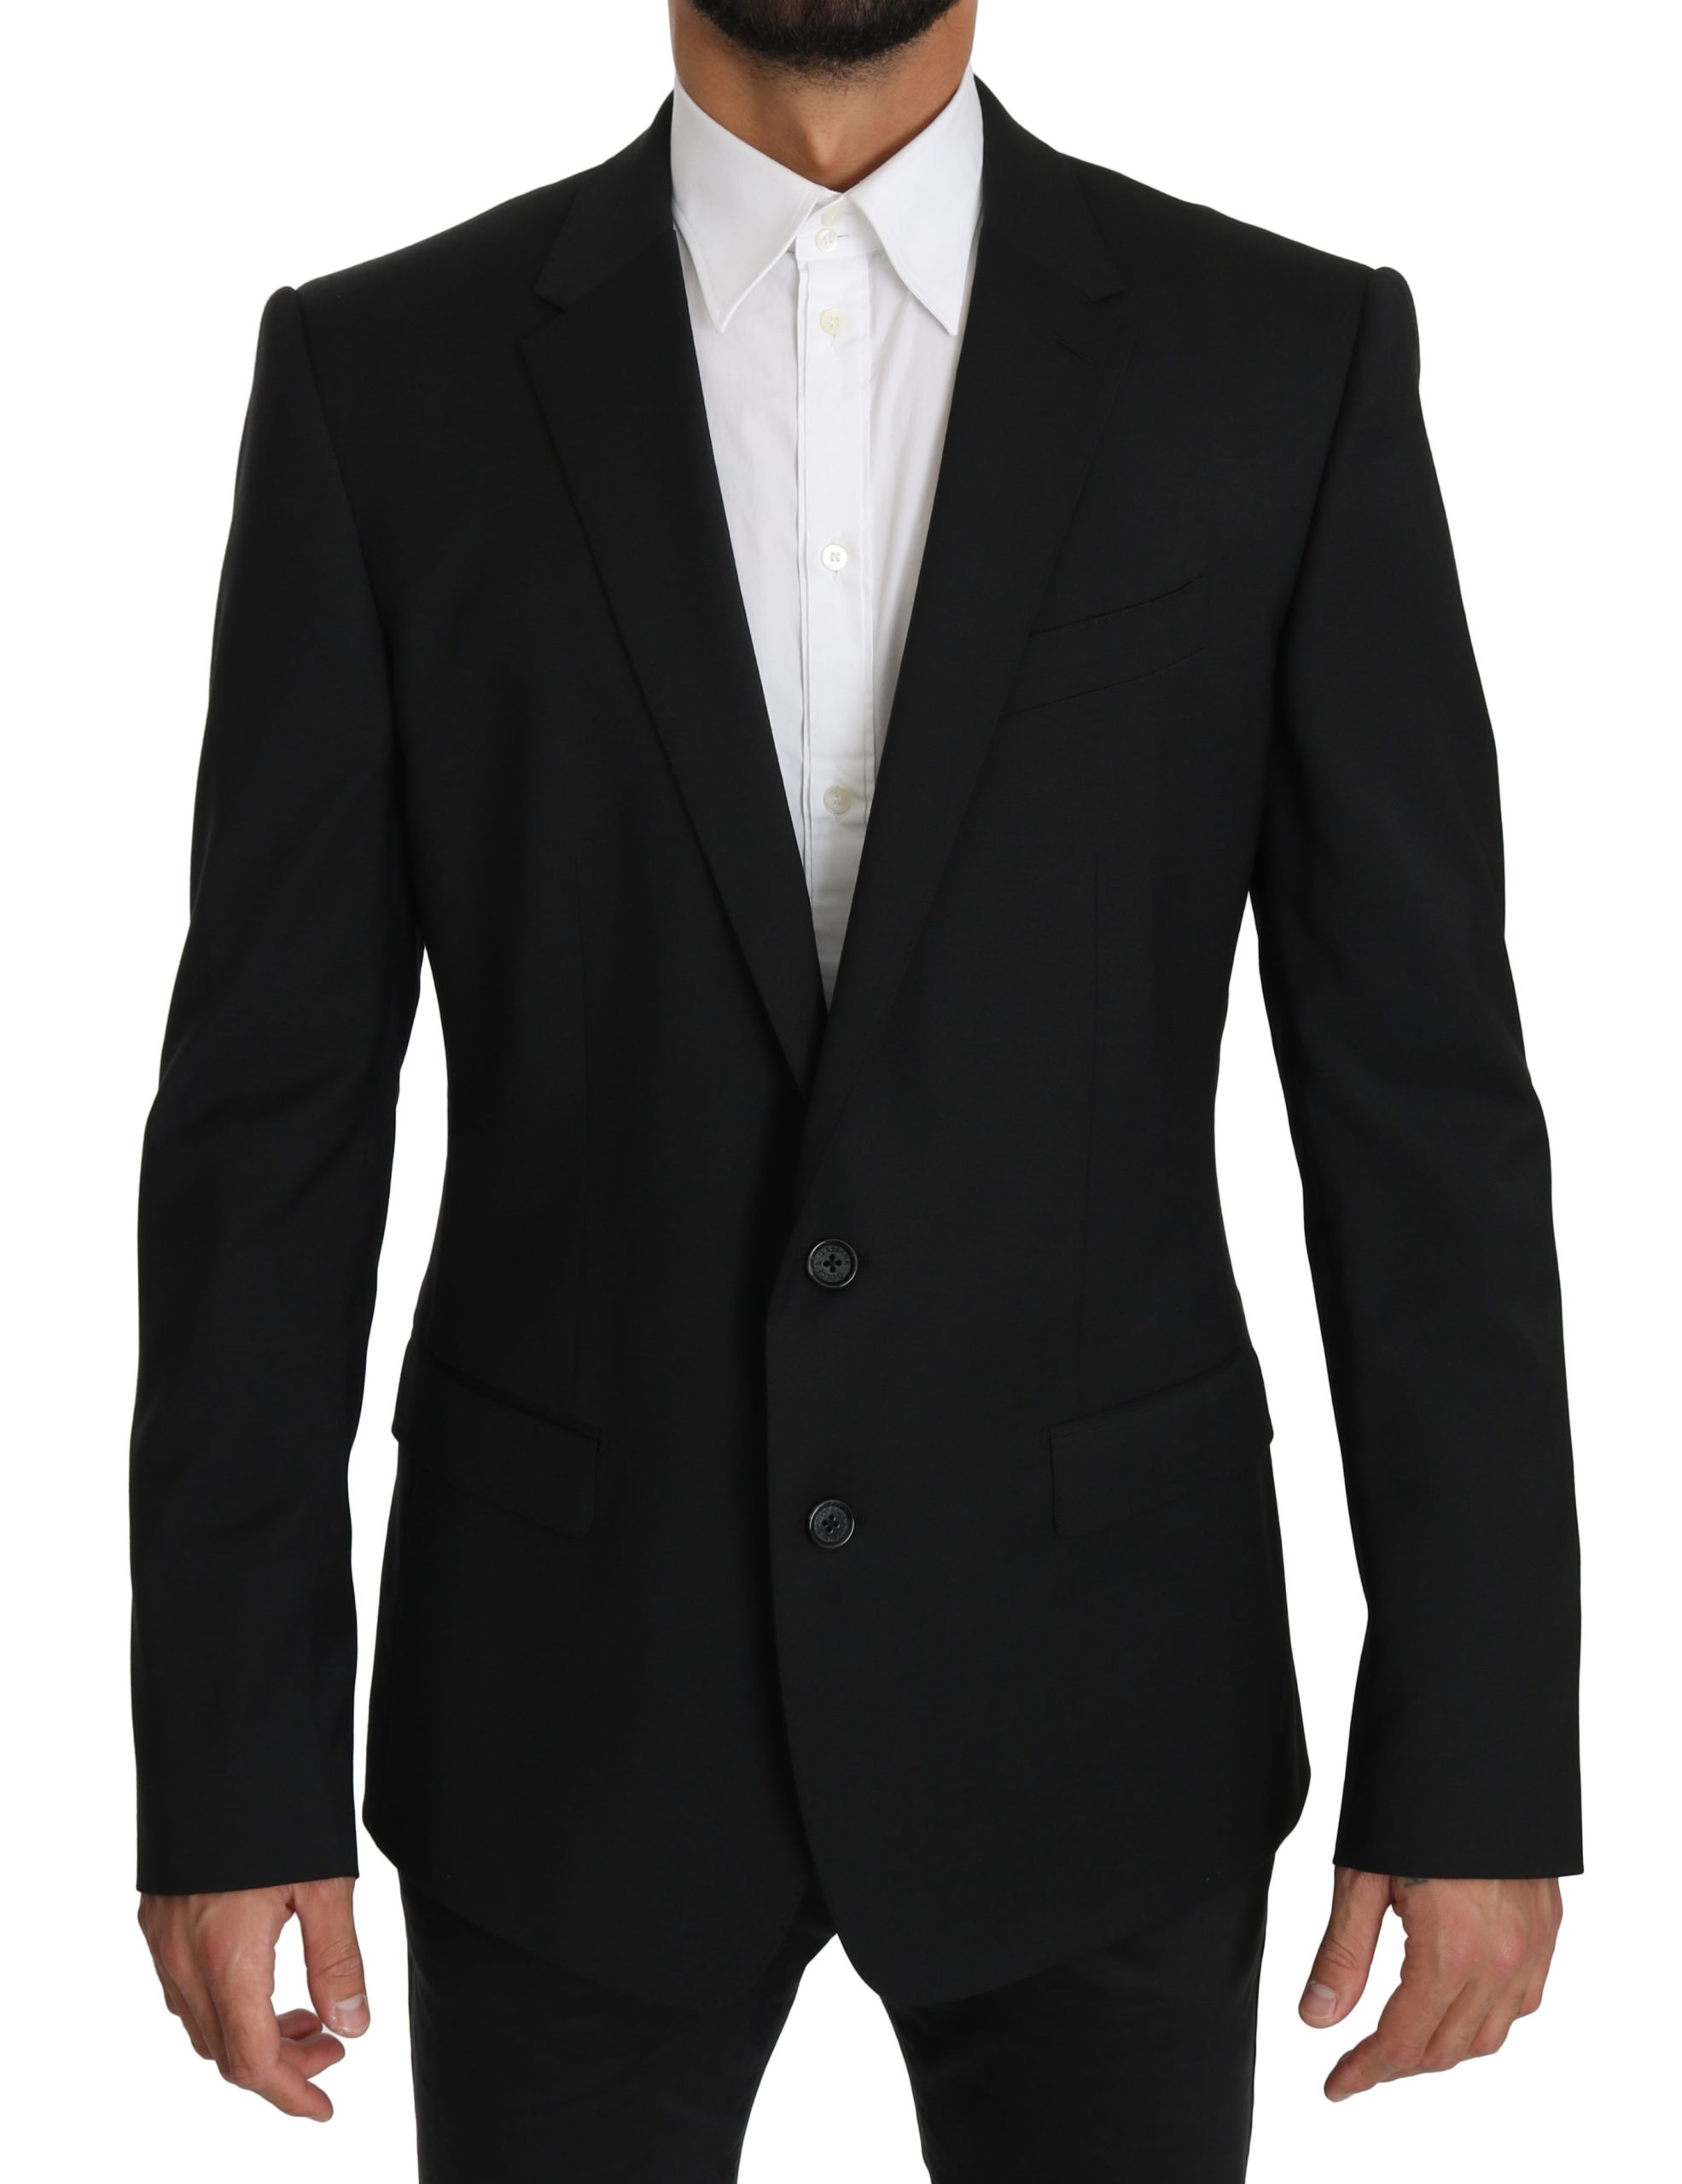 Dolce & Gabbana Men's Single Breasted MARTINI Blazer Black JKT2482 - IT52   XL